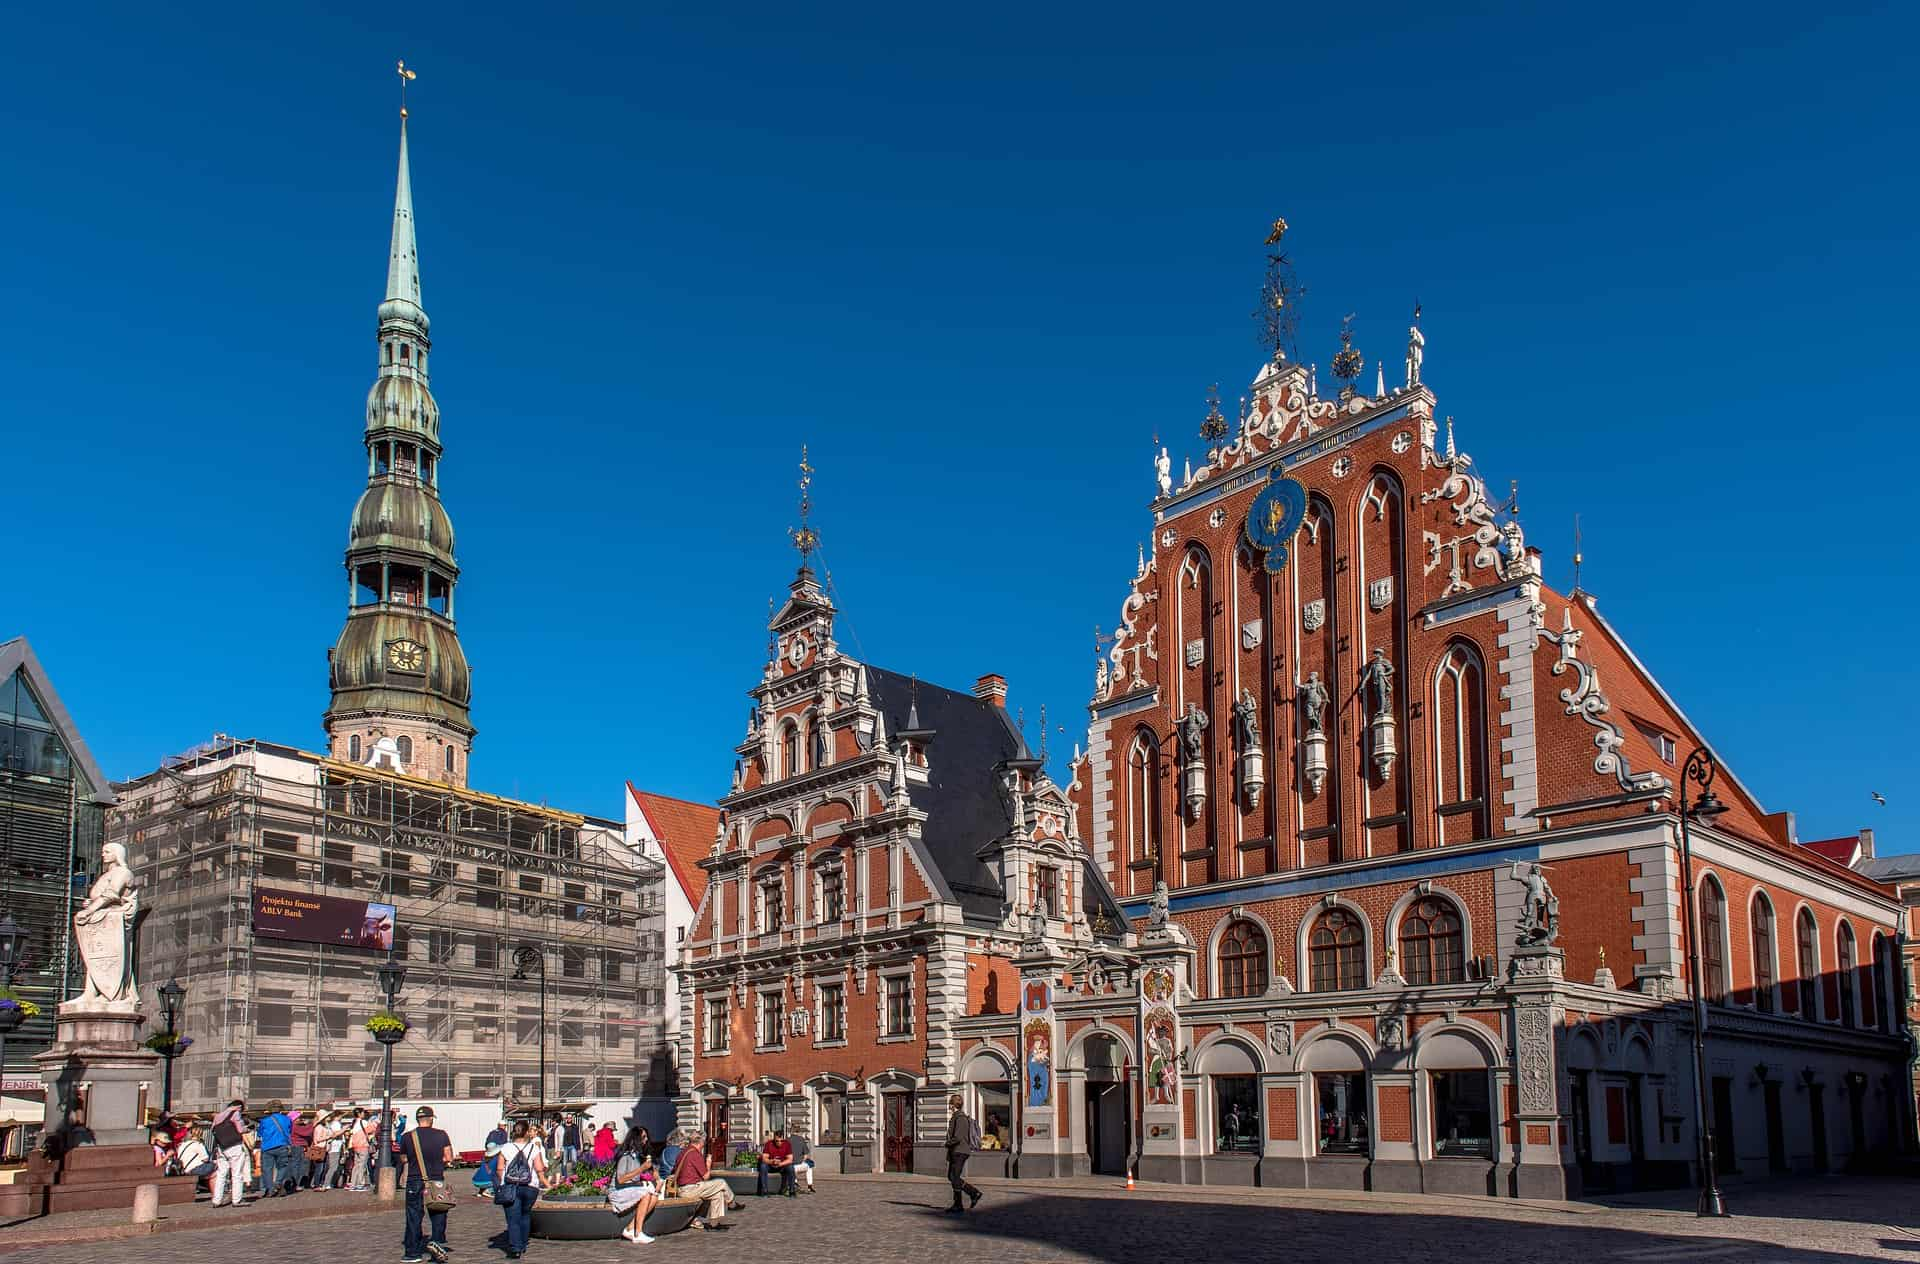 Riga Urlaub - eine Woche ab 85,00€ Flug und Hotel